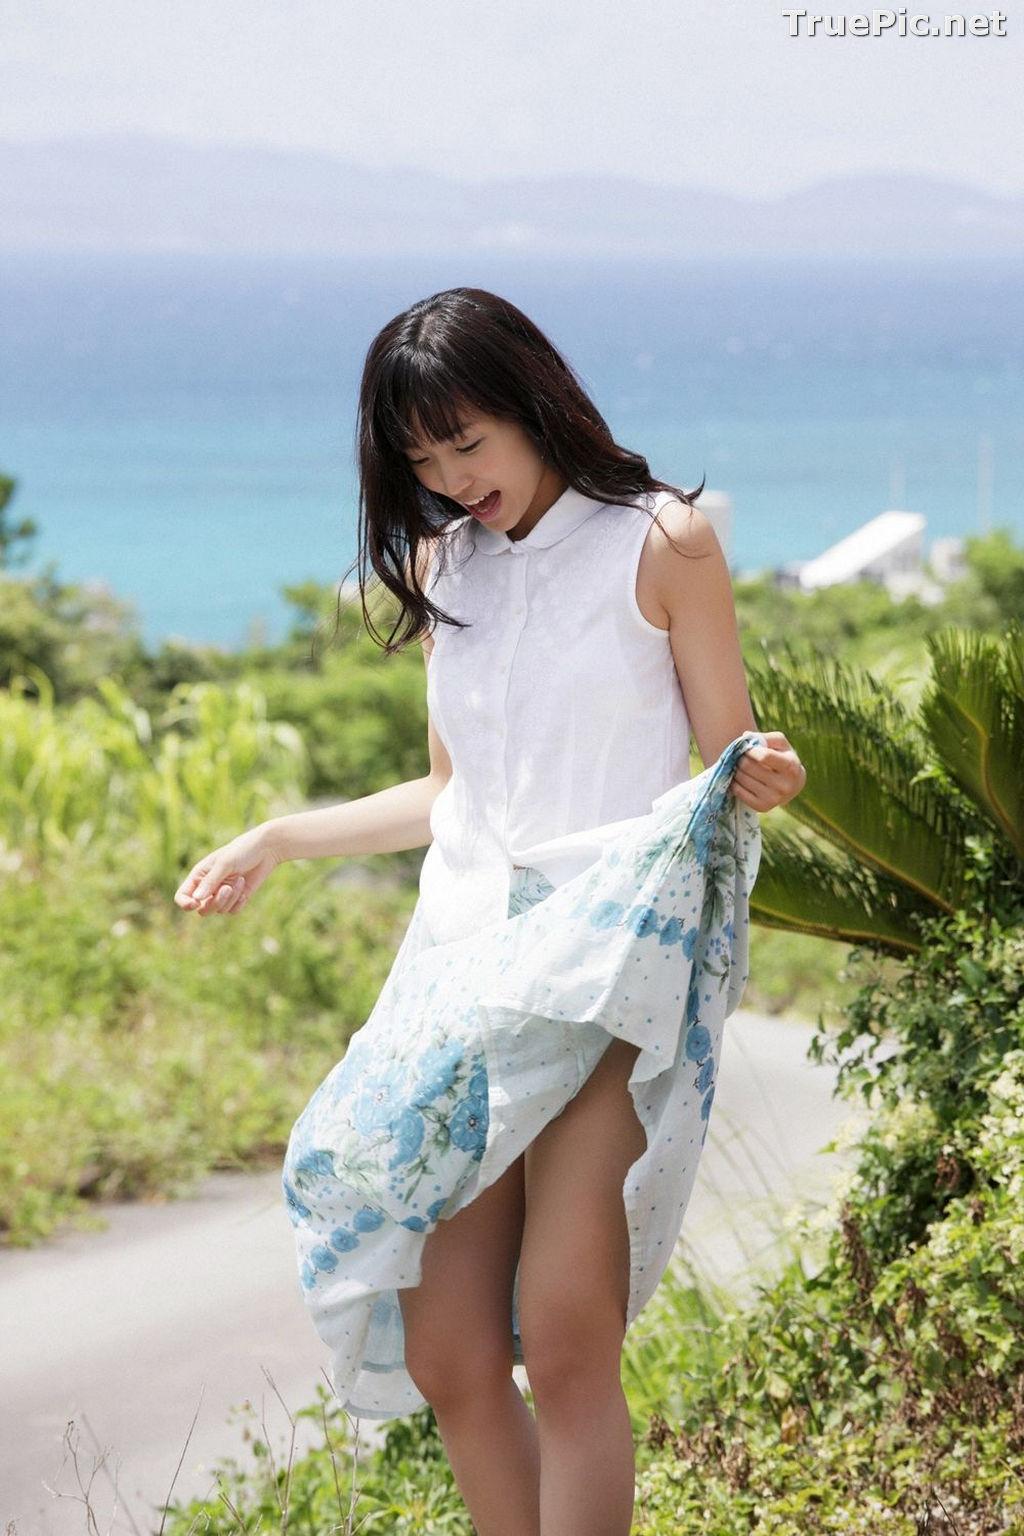 Image [YS Web] Vol.527 - Japanese Gravure Idol and Singer - Risa Yoshiki - TruePic.net - Picture-2